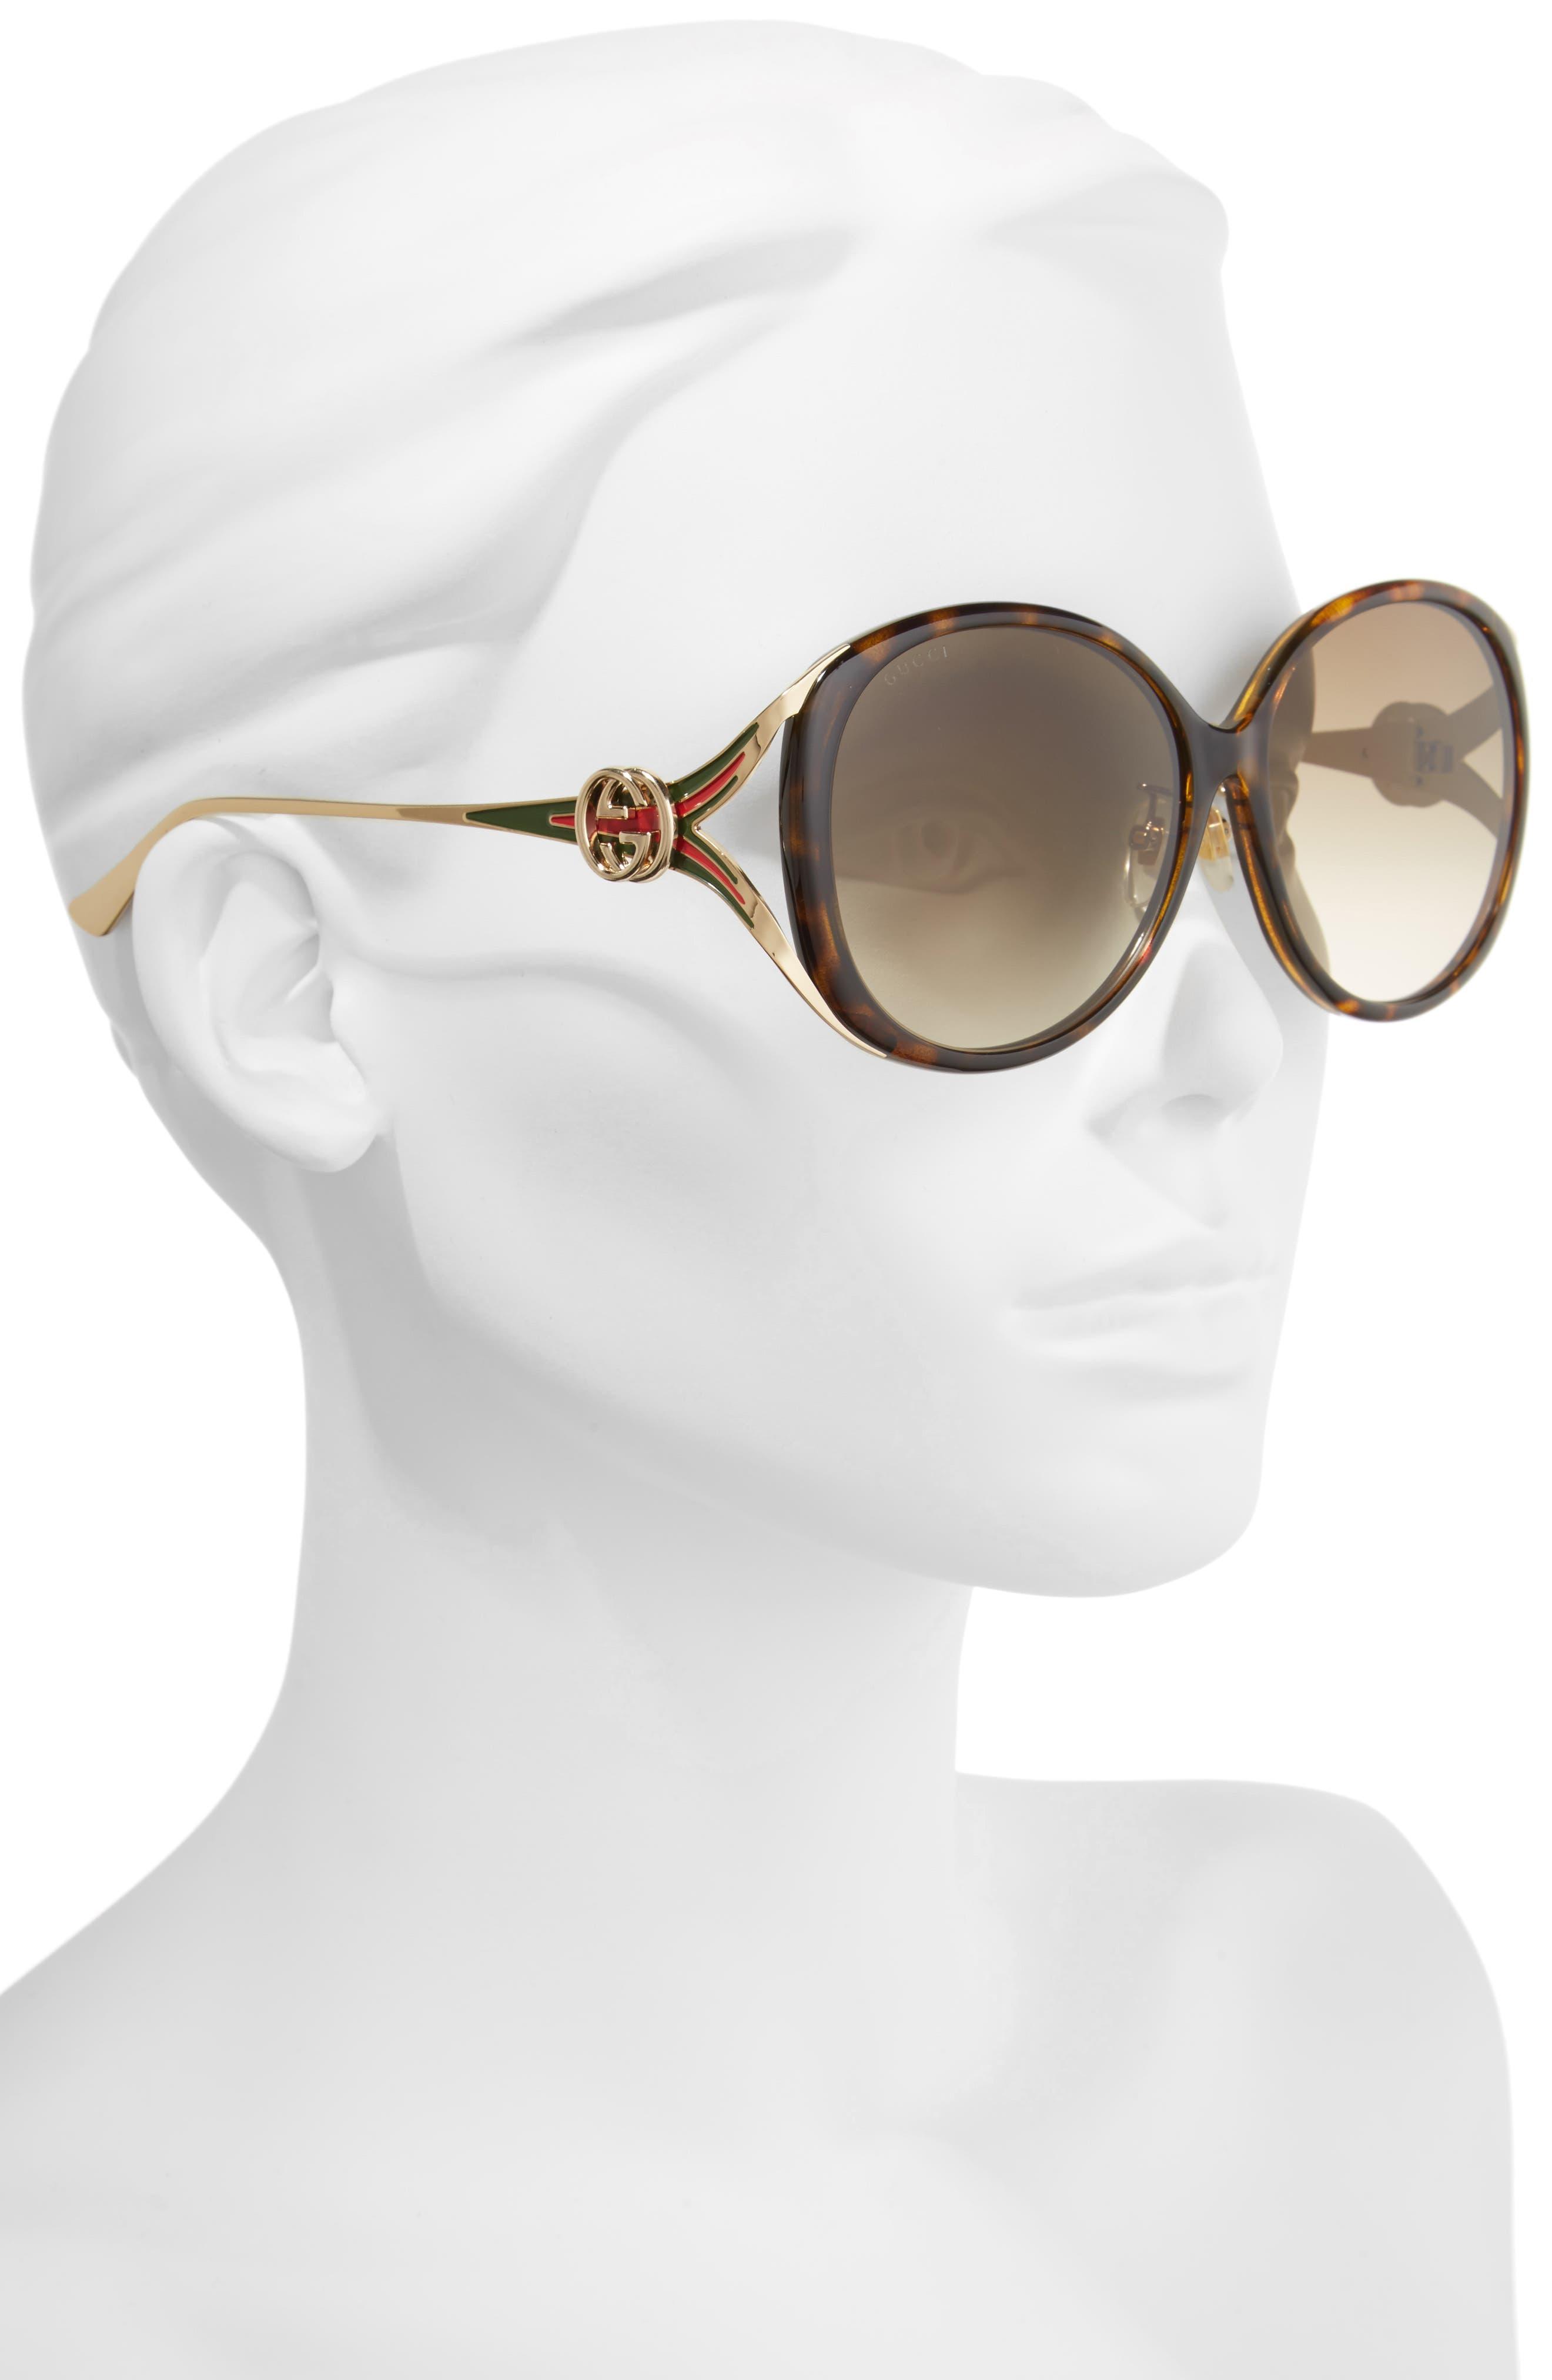 60mm Round Sunglasses,                             Alternate thumbnail 2, color,                             HAVANA